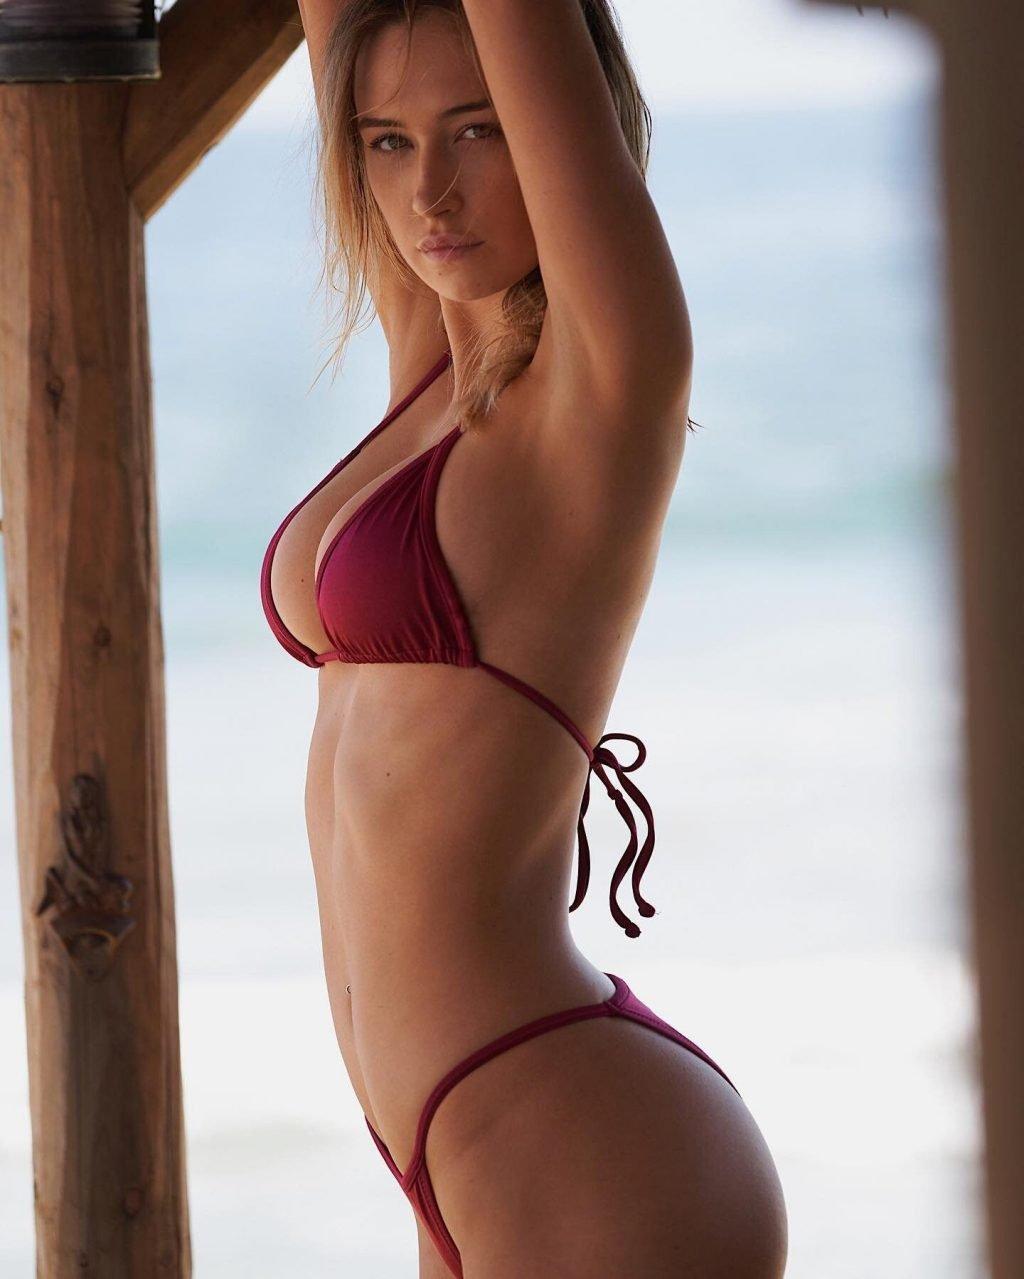 Elsie Hewitt Sexy & Topless (7 Photos)